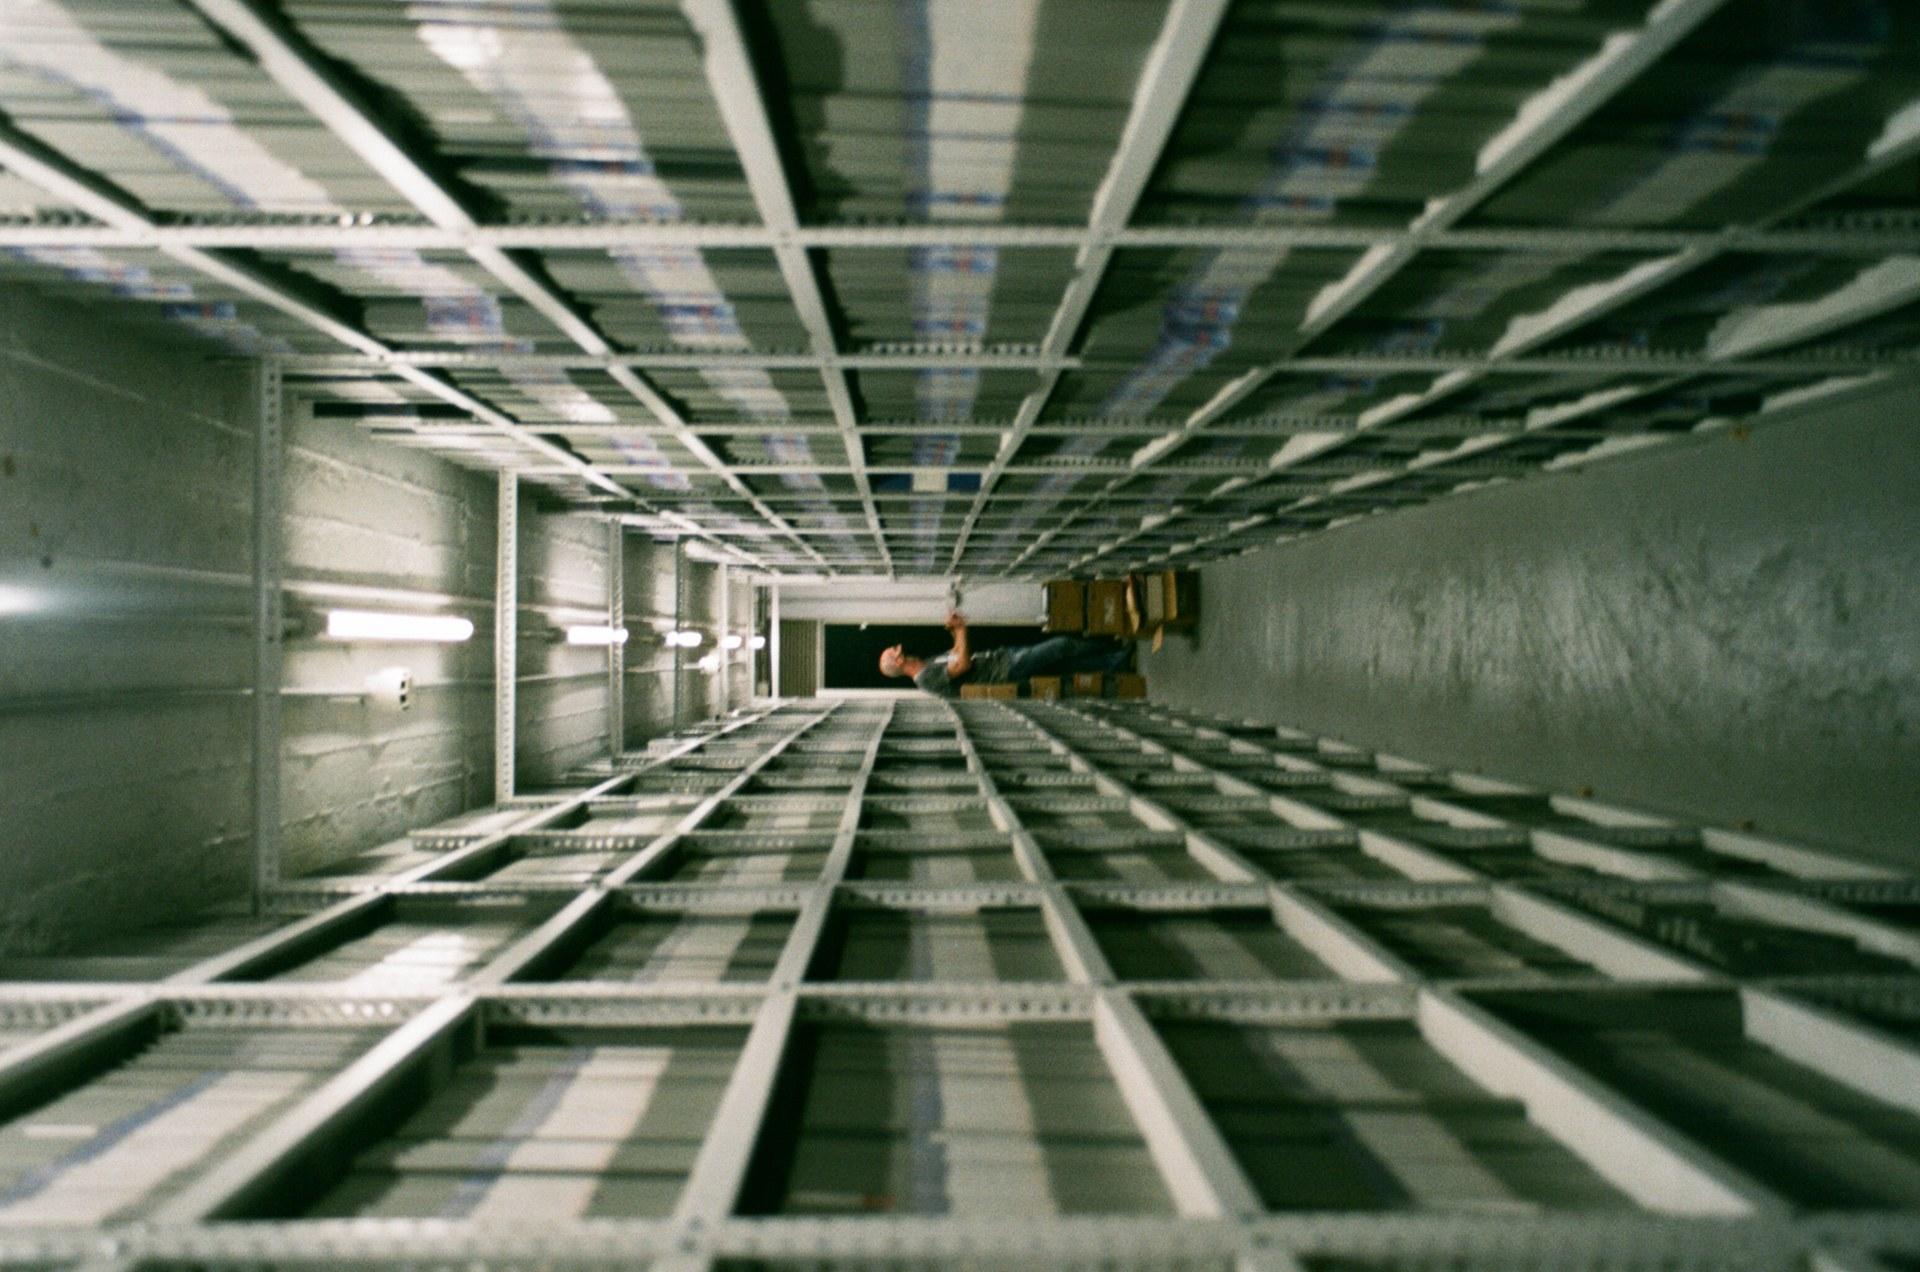 MTV (Murr TV), archive rooms